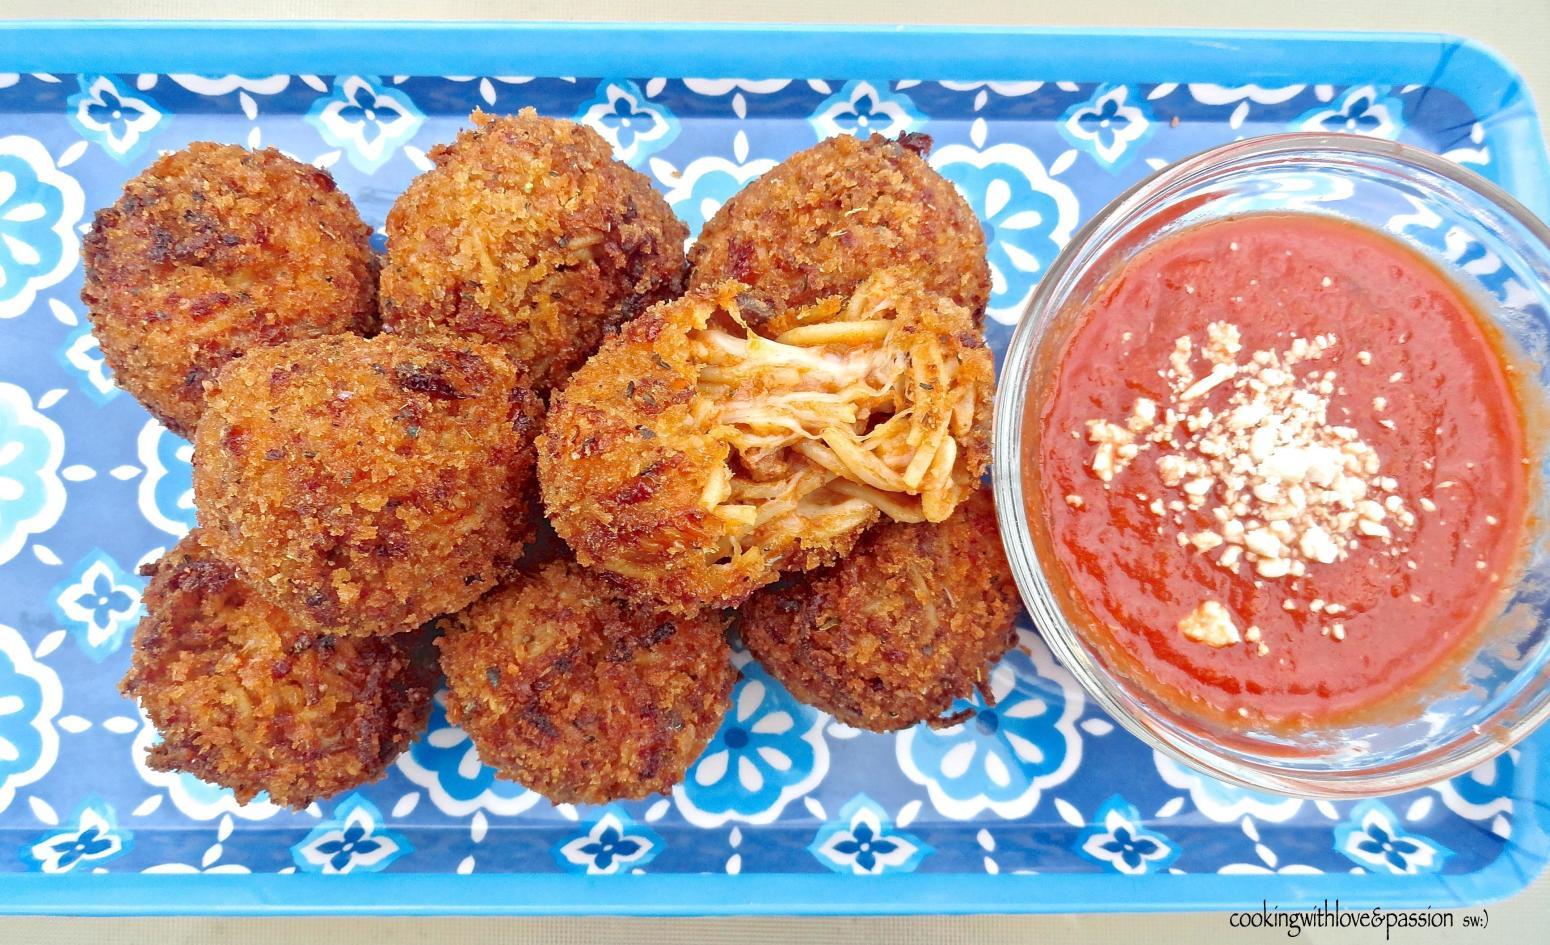 They be Lovin' Dem Deep Fried Spaghetti Balls Recipe